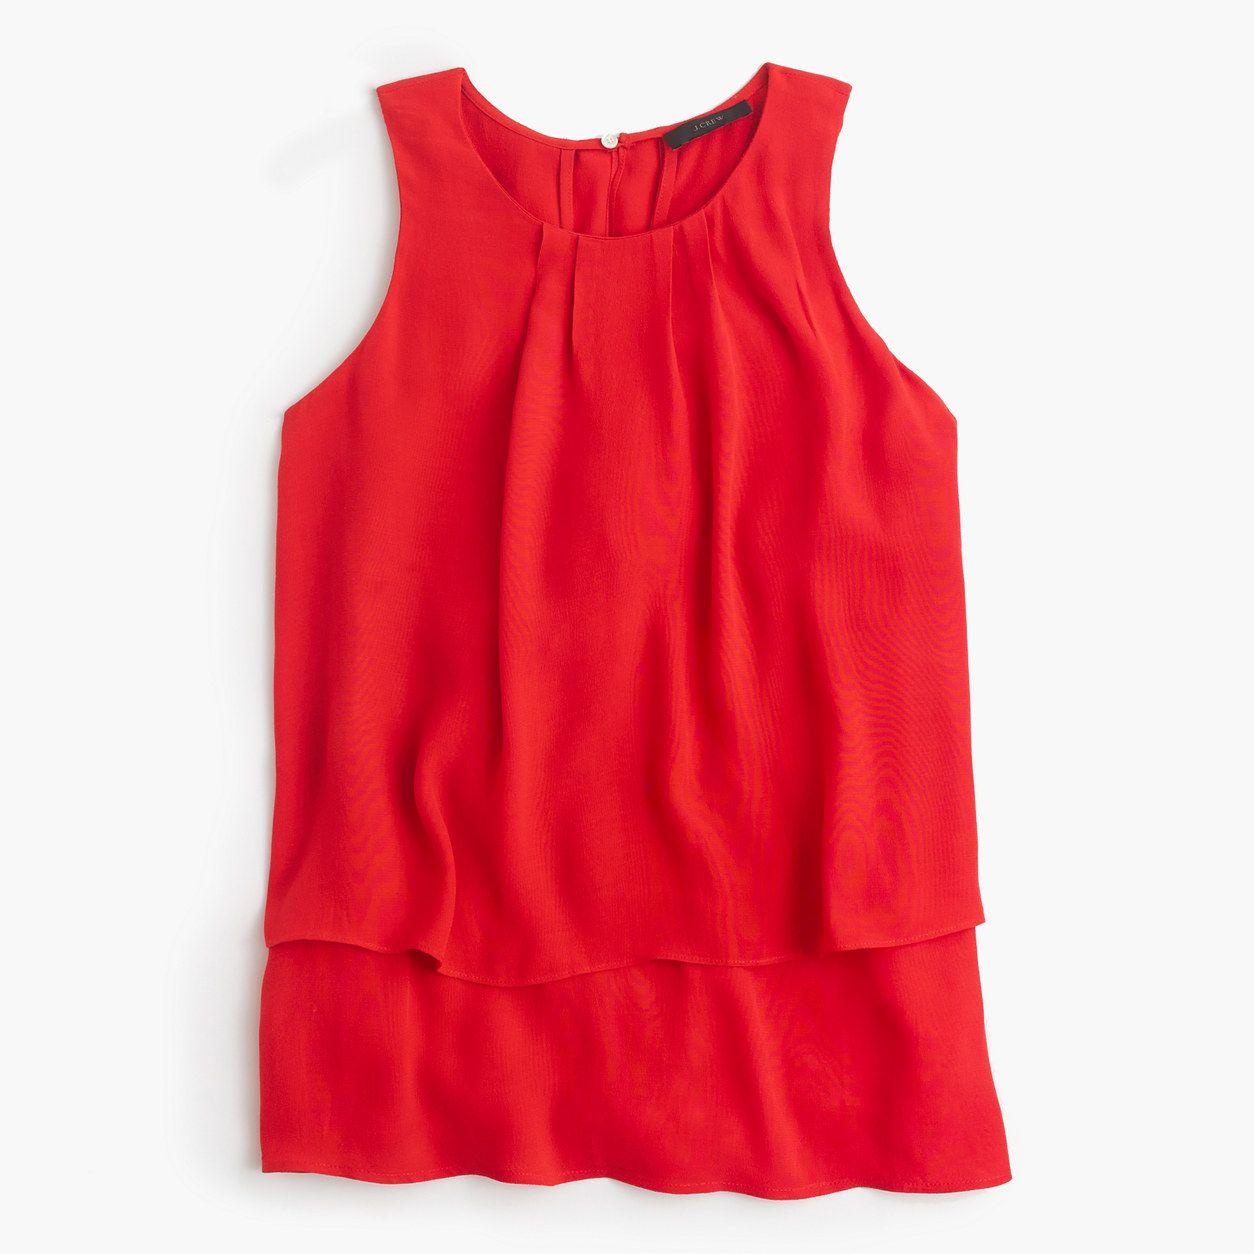 Tiered crepe top : tops & blouses | J.Crew